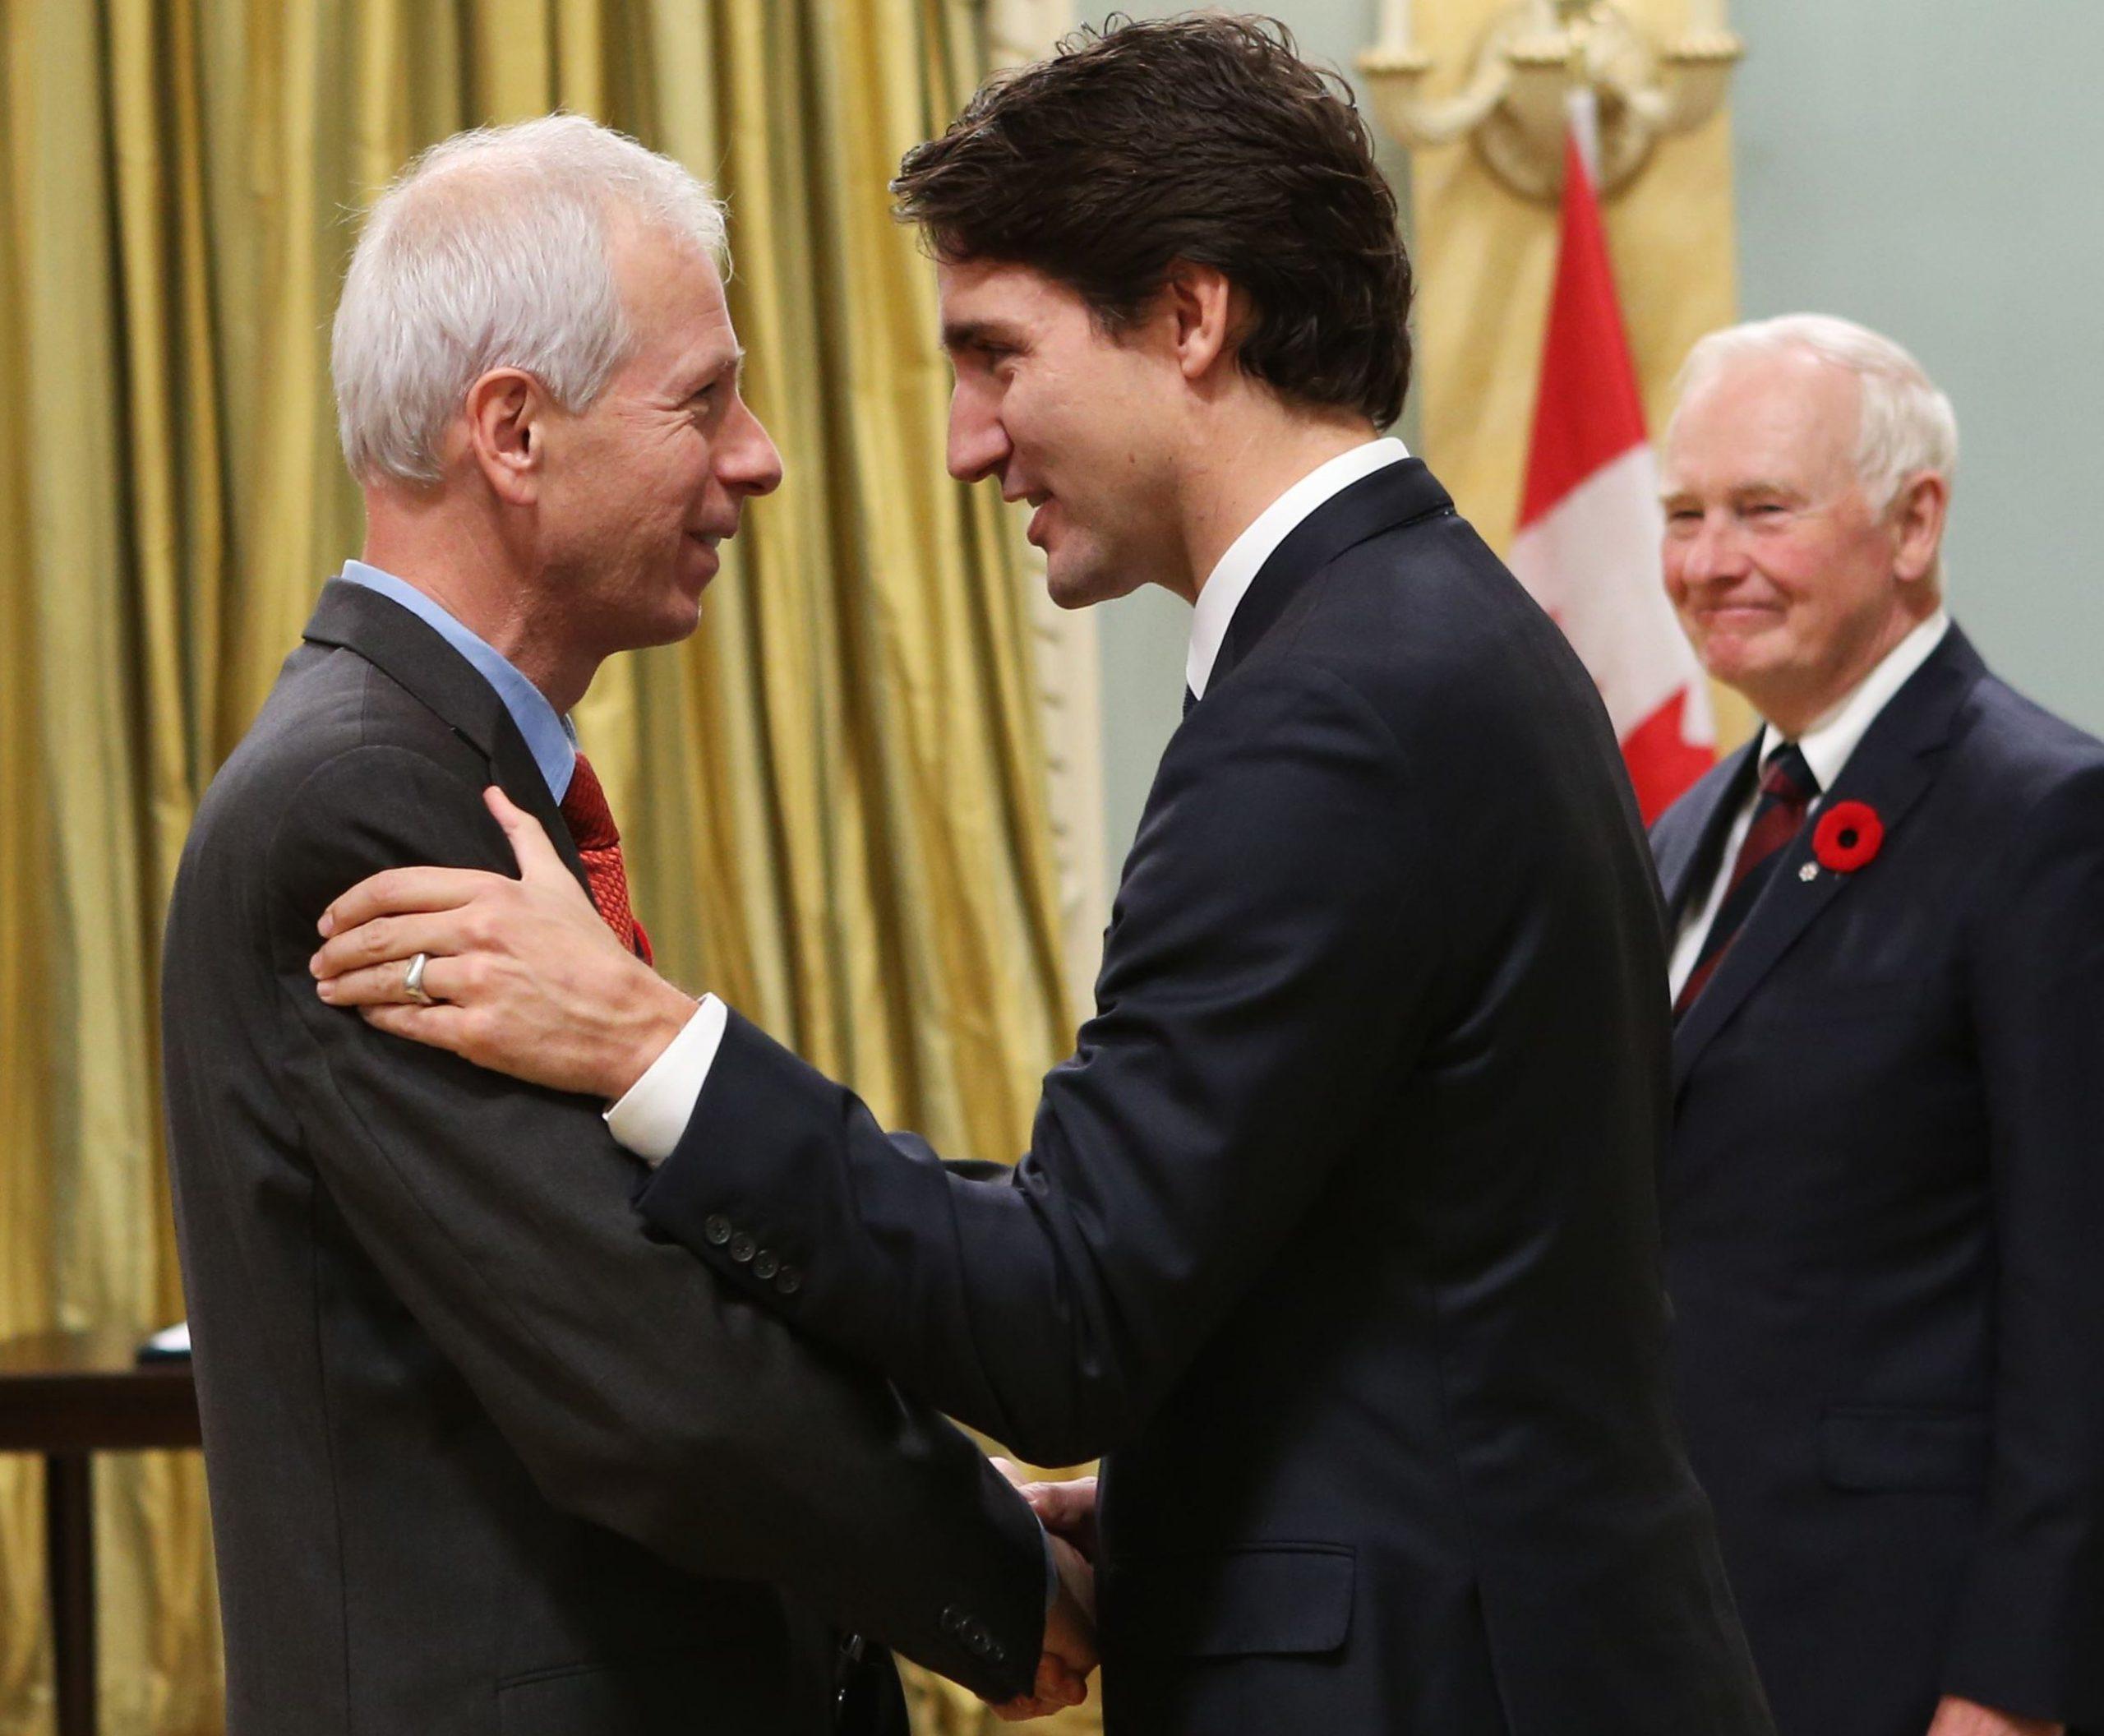 CANADA-POLITICS-.original.jpg